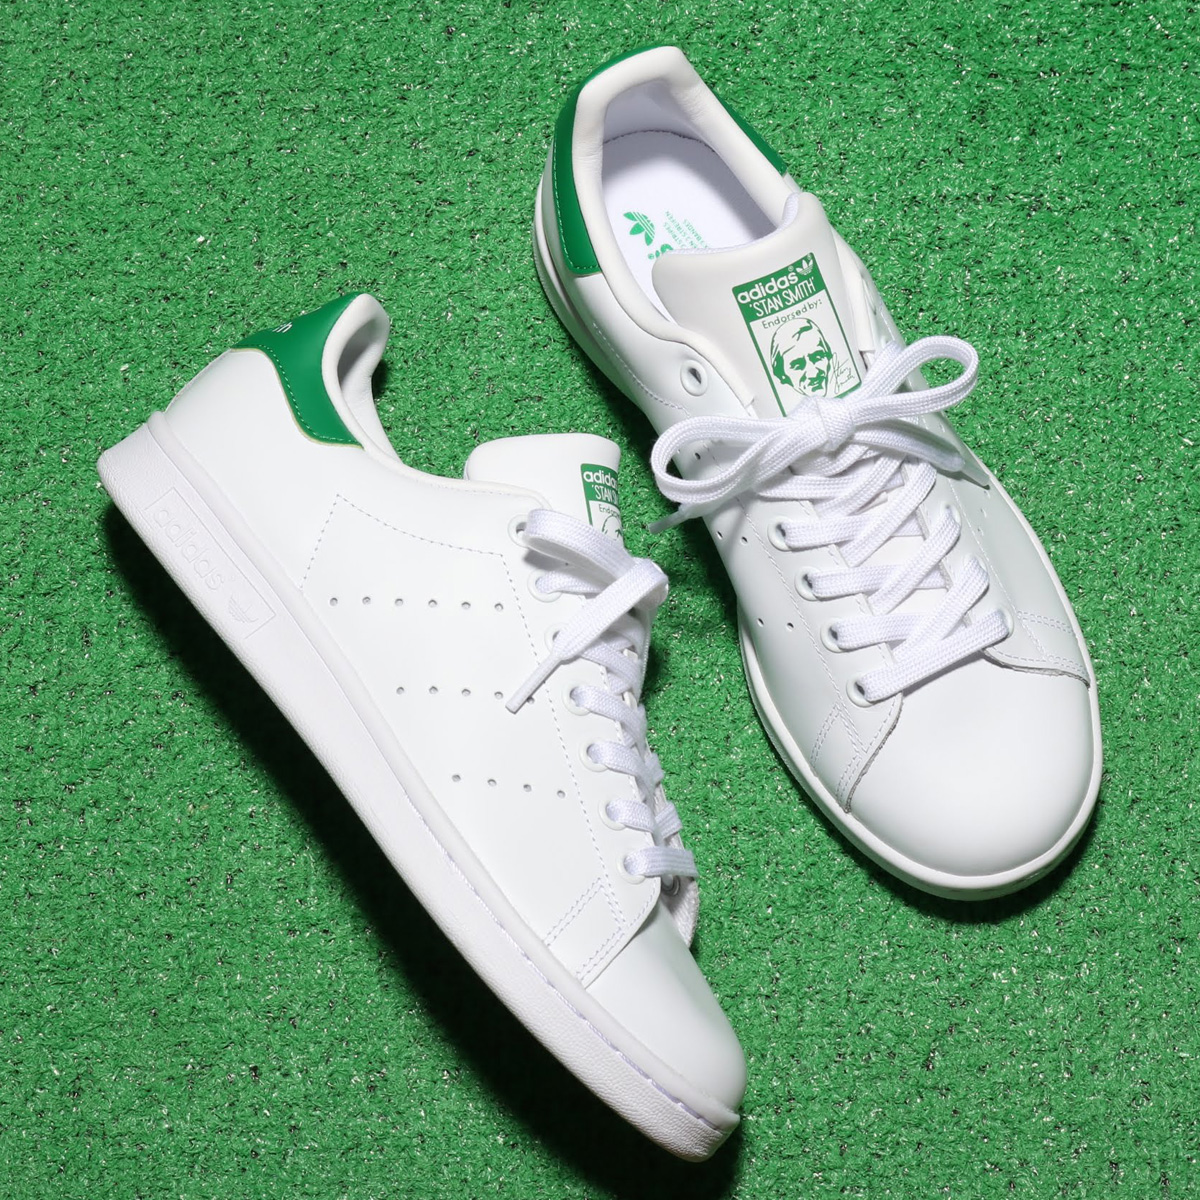 adidas Originals STAN SMITH W(アディダスオリジナルス スタンスミス W)RUNNING WHITE/RUNNING WHITE/GREEN【メンズ レディース スニーカー】19FW-I